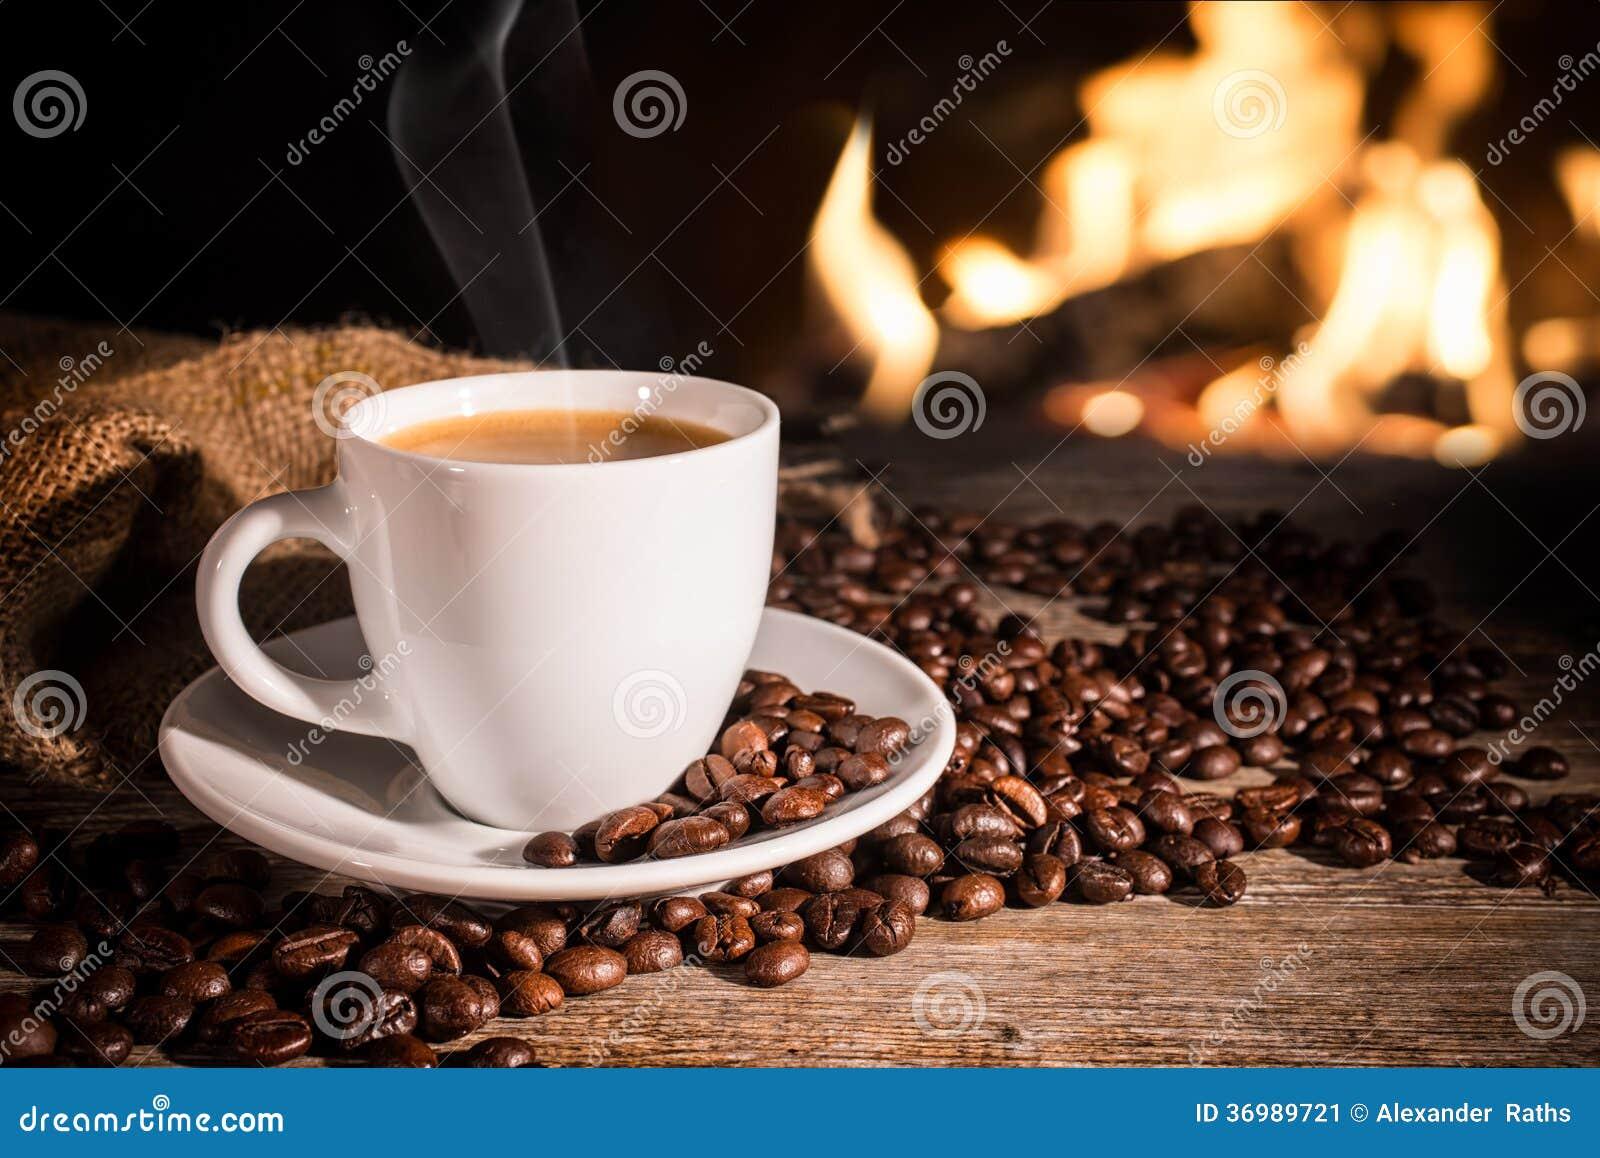 Kop van hete koffie